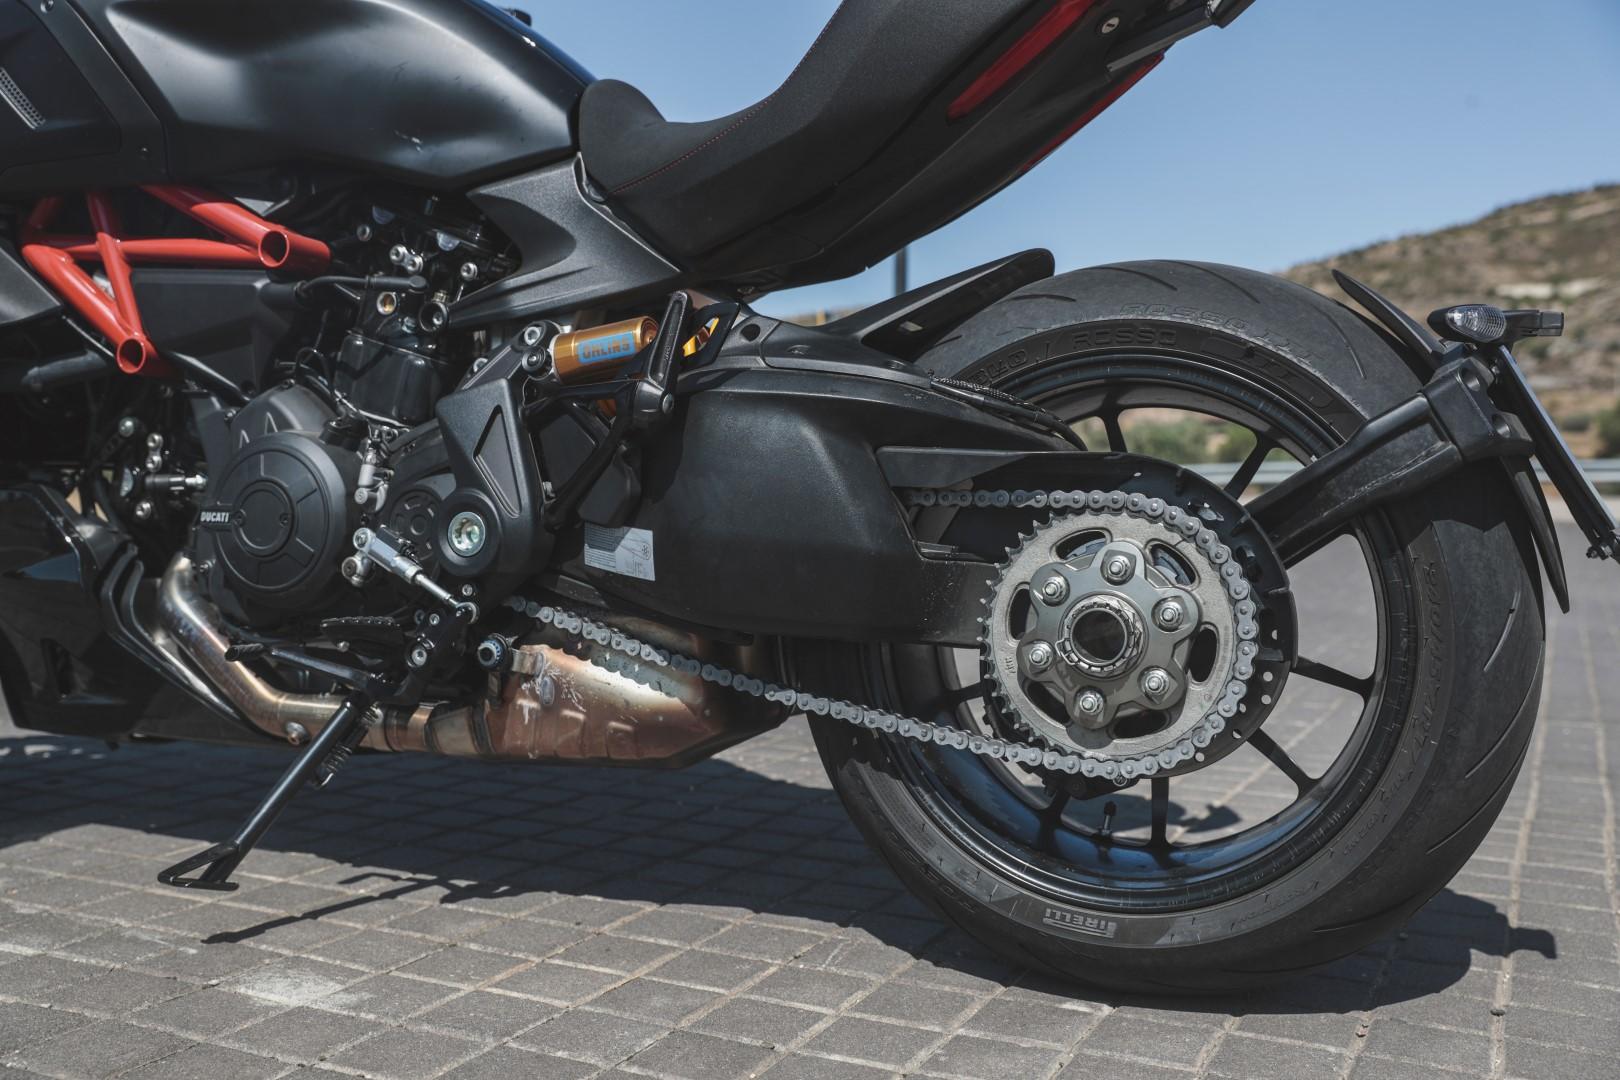 Ducati Diavel 1260 S, superprueba, fotos y ficha técnica